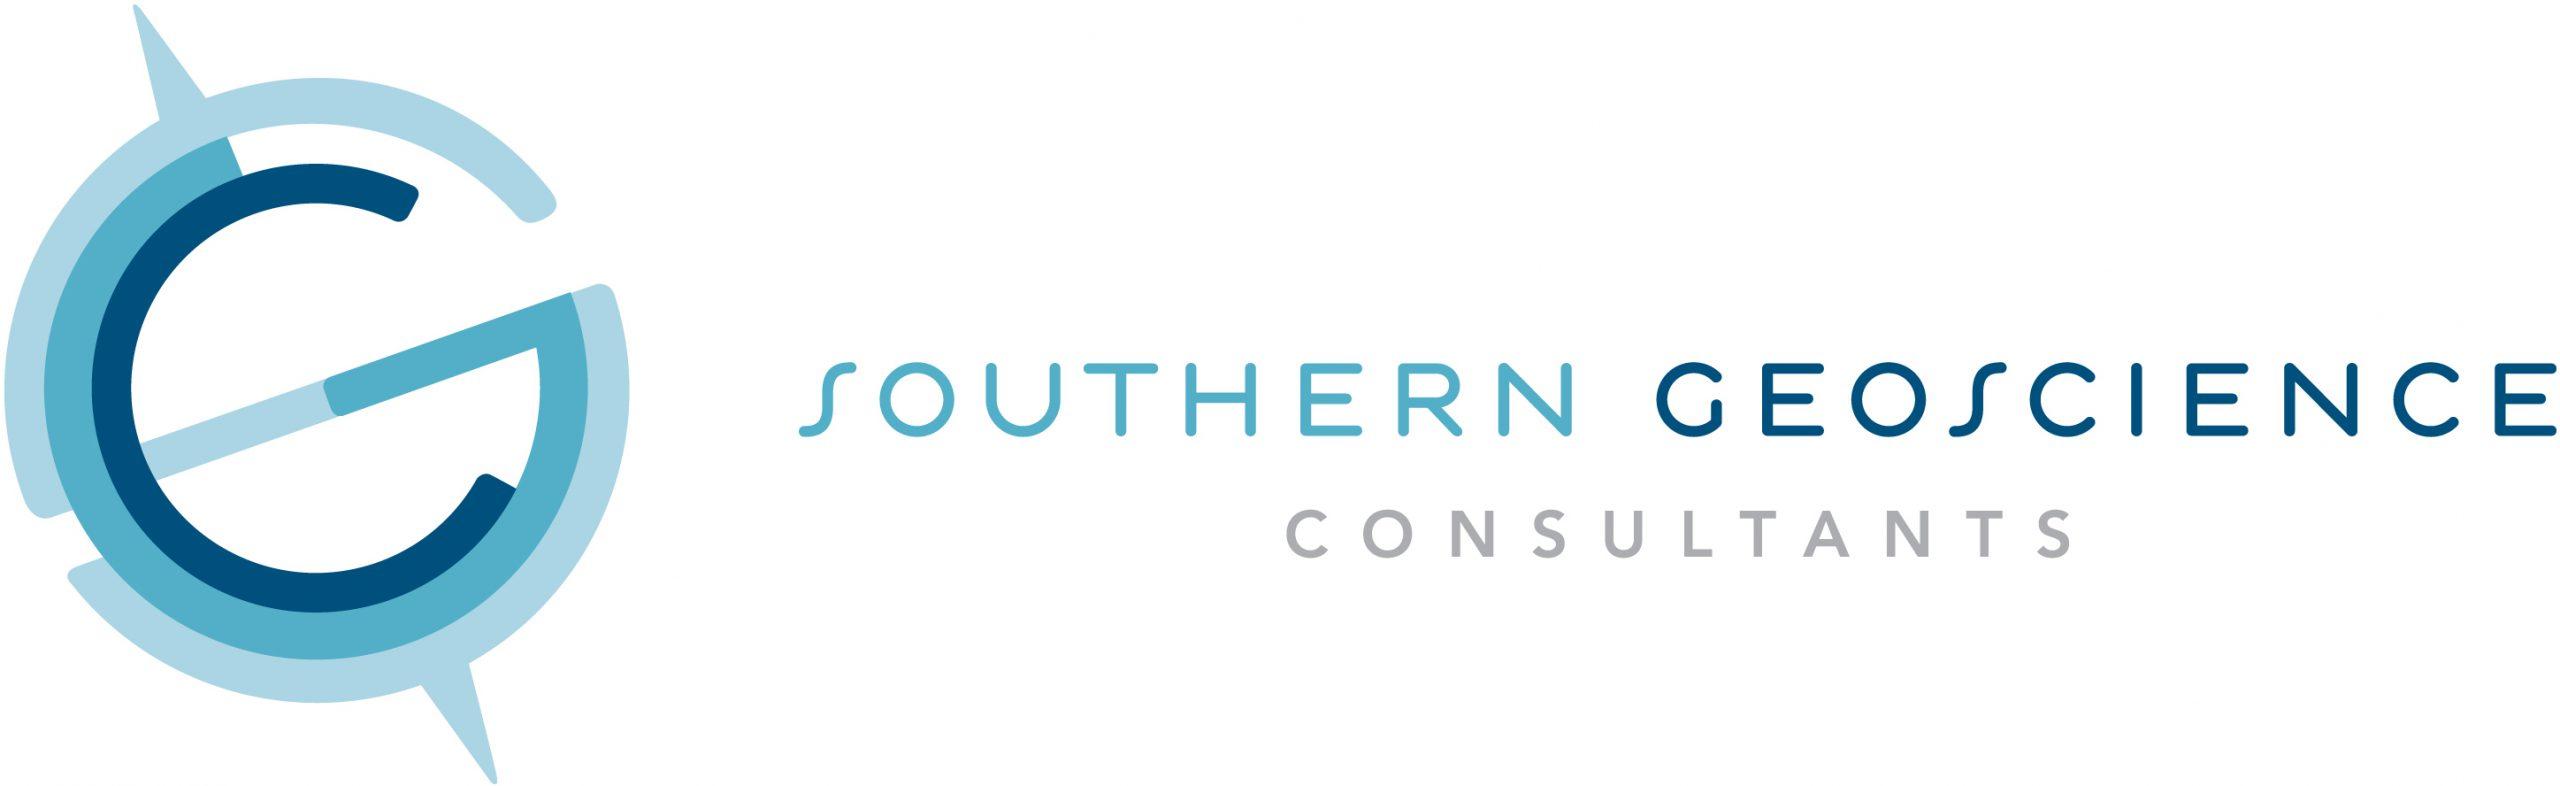 sgc-logo-landscape